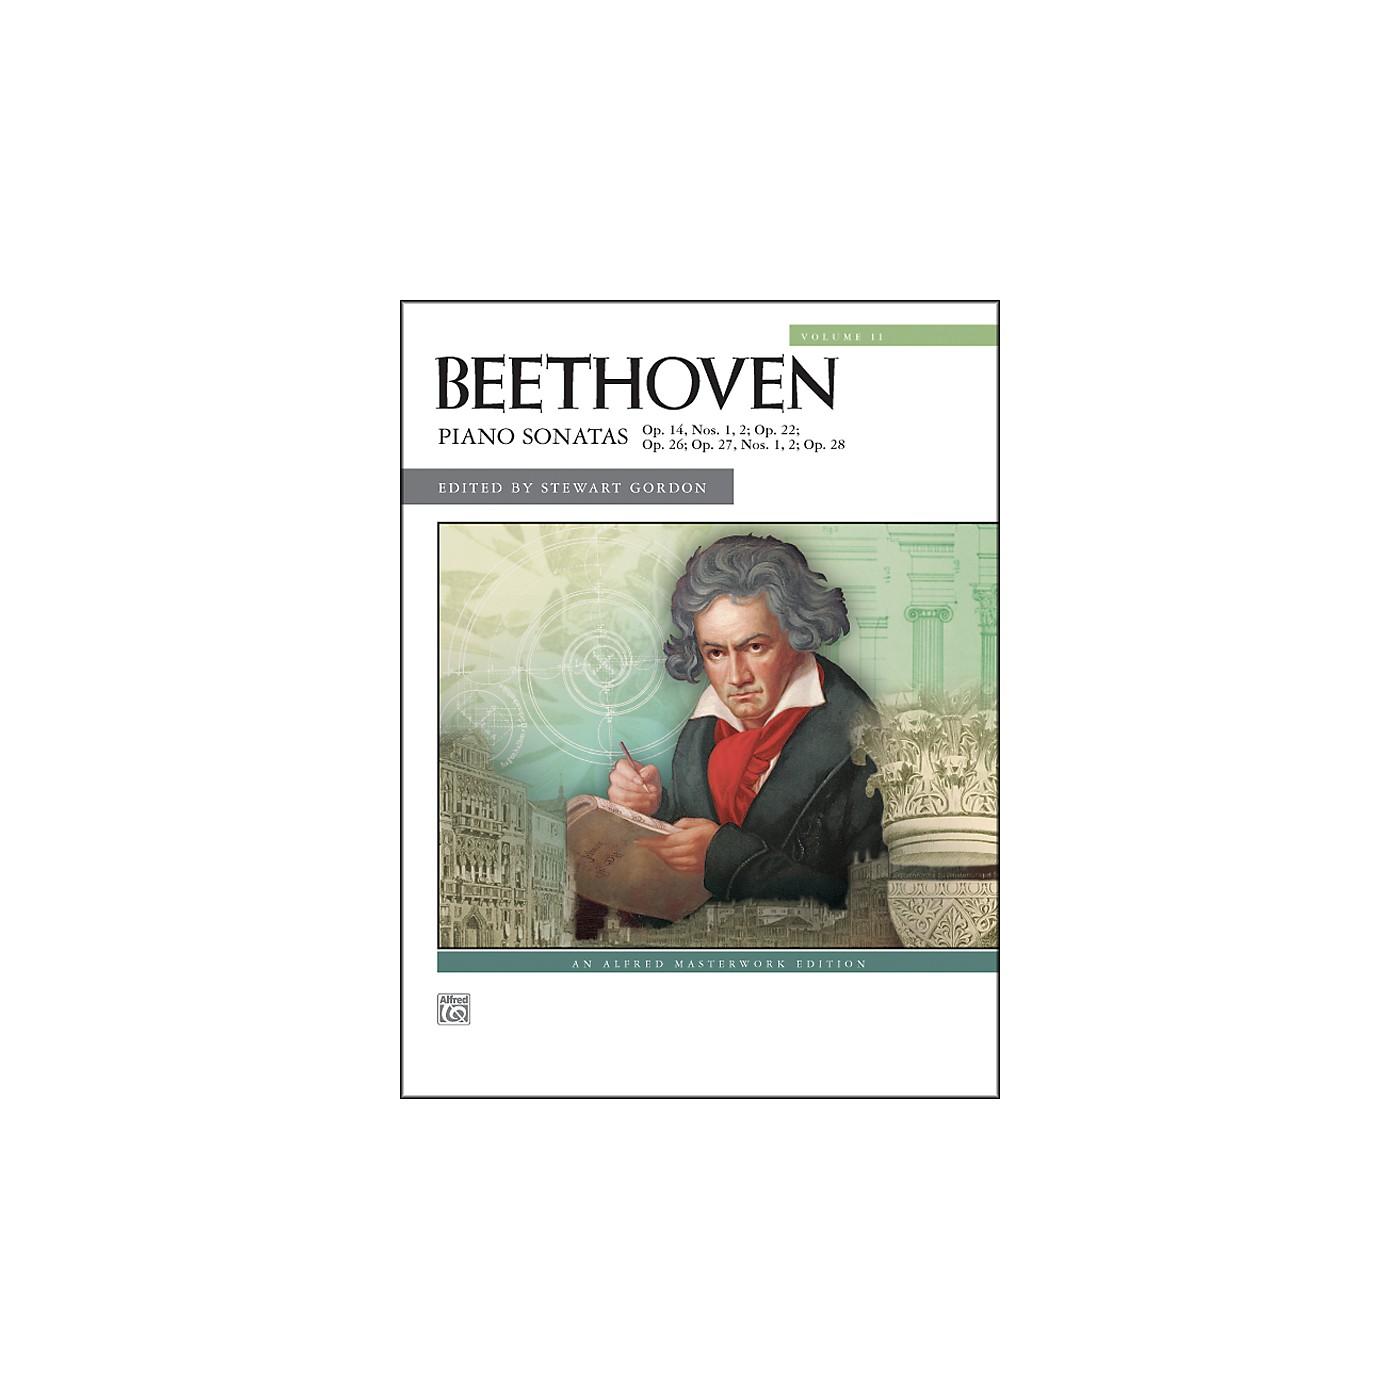 Alfred Piano Sonatas Volume 2 (Nos. 9-15) Volume 2 (Nos. 9-15) thumbnail